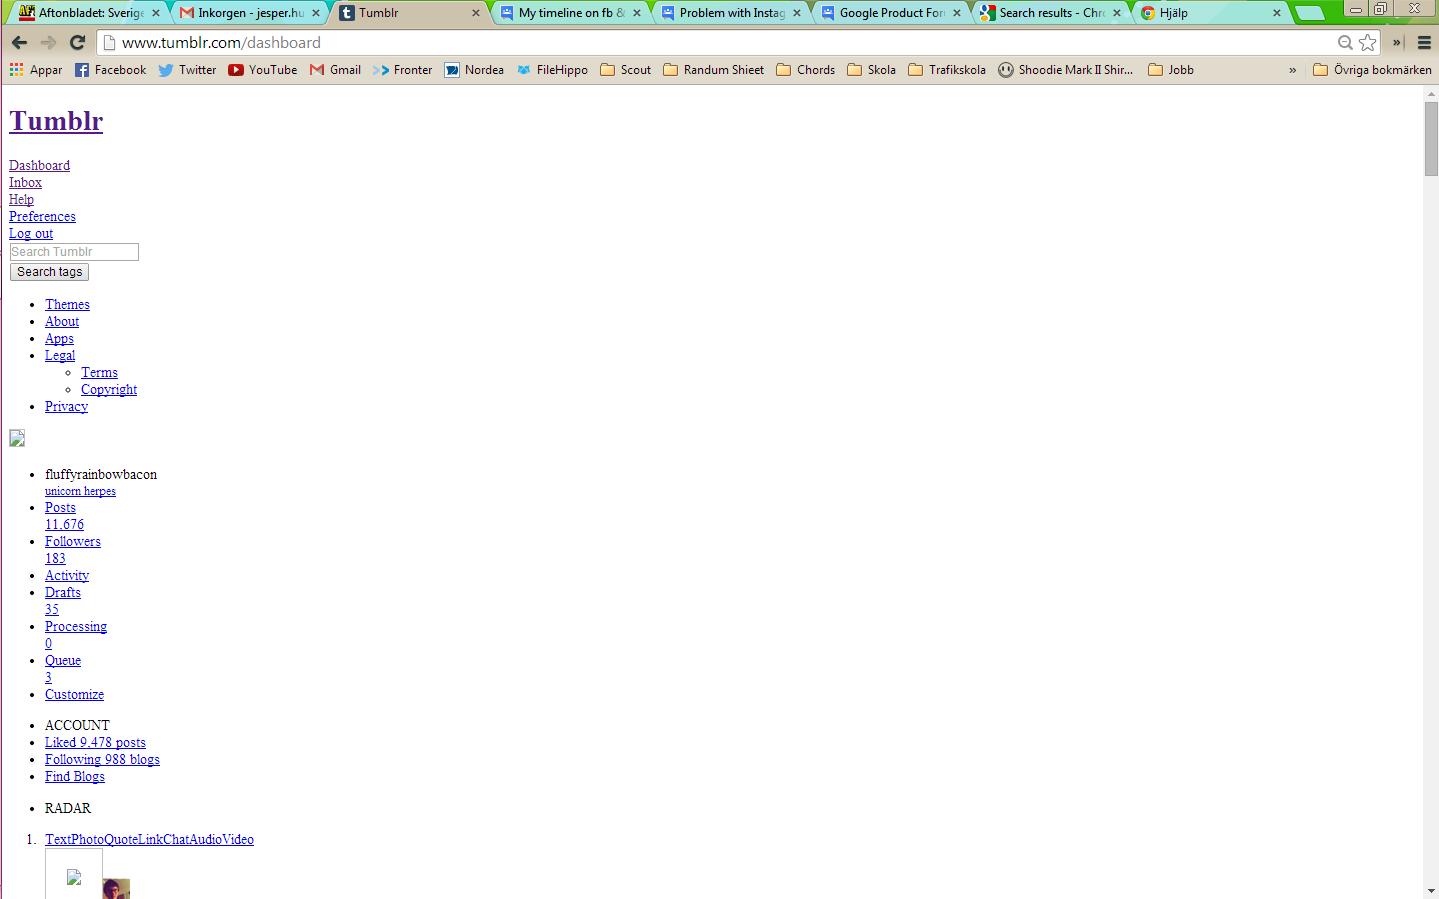 Tumblr is not working  - Google Chrome Help